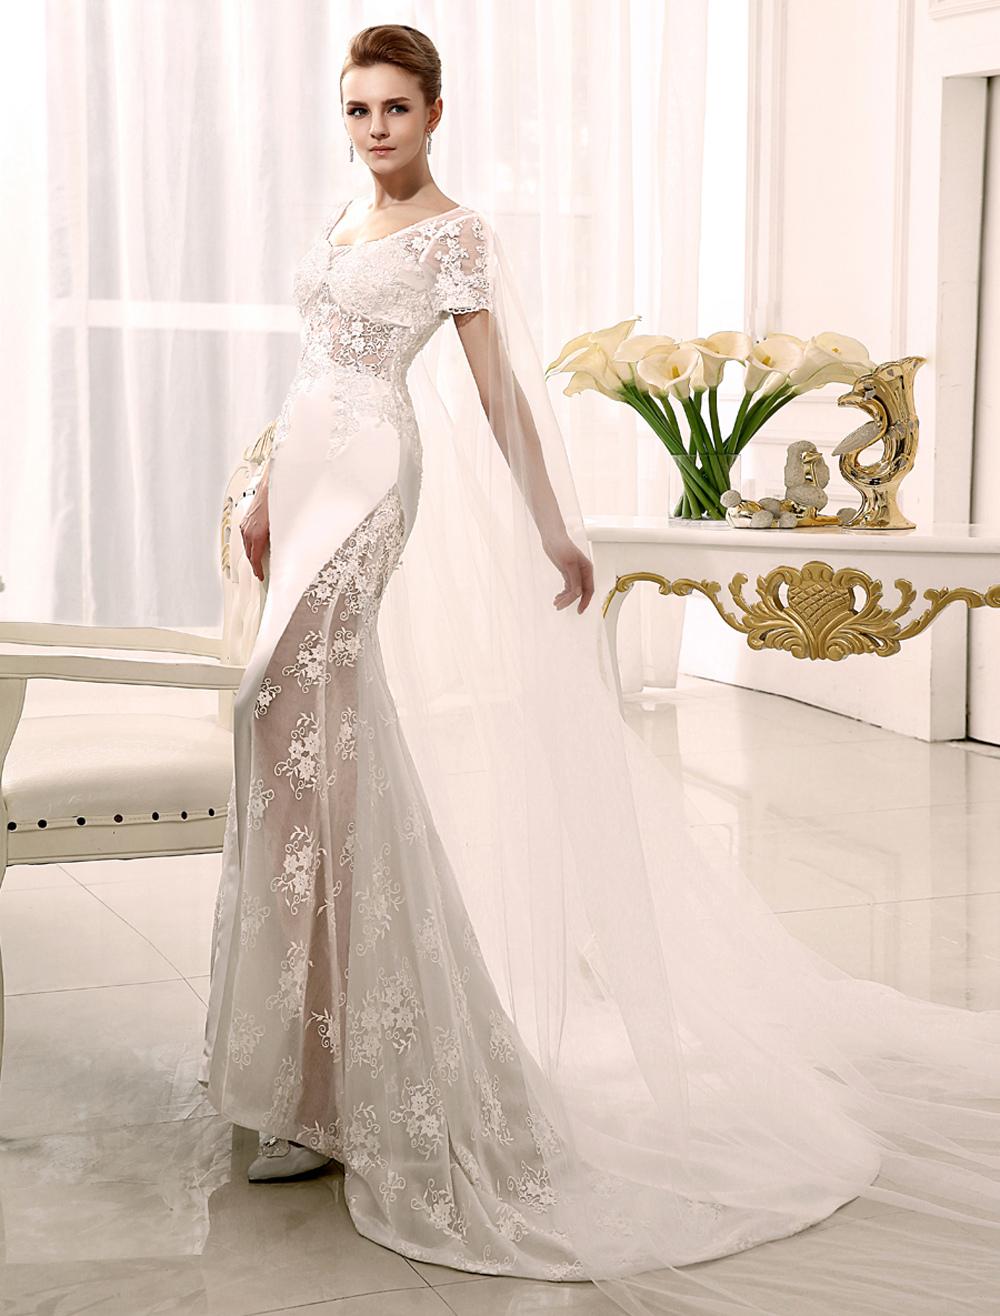 Boho Wedding Dress Mermaid Watteau Train Ivory Applique Bridal Wedding Dress With Scoop Neck Milanoo